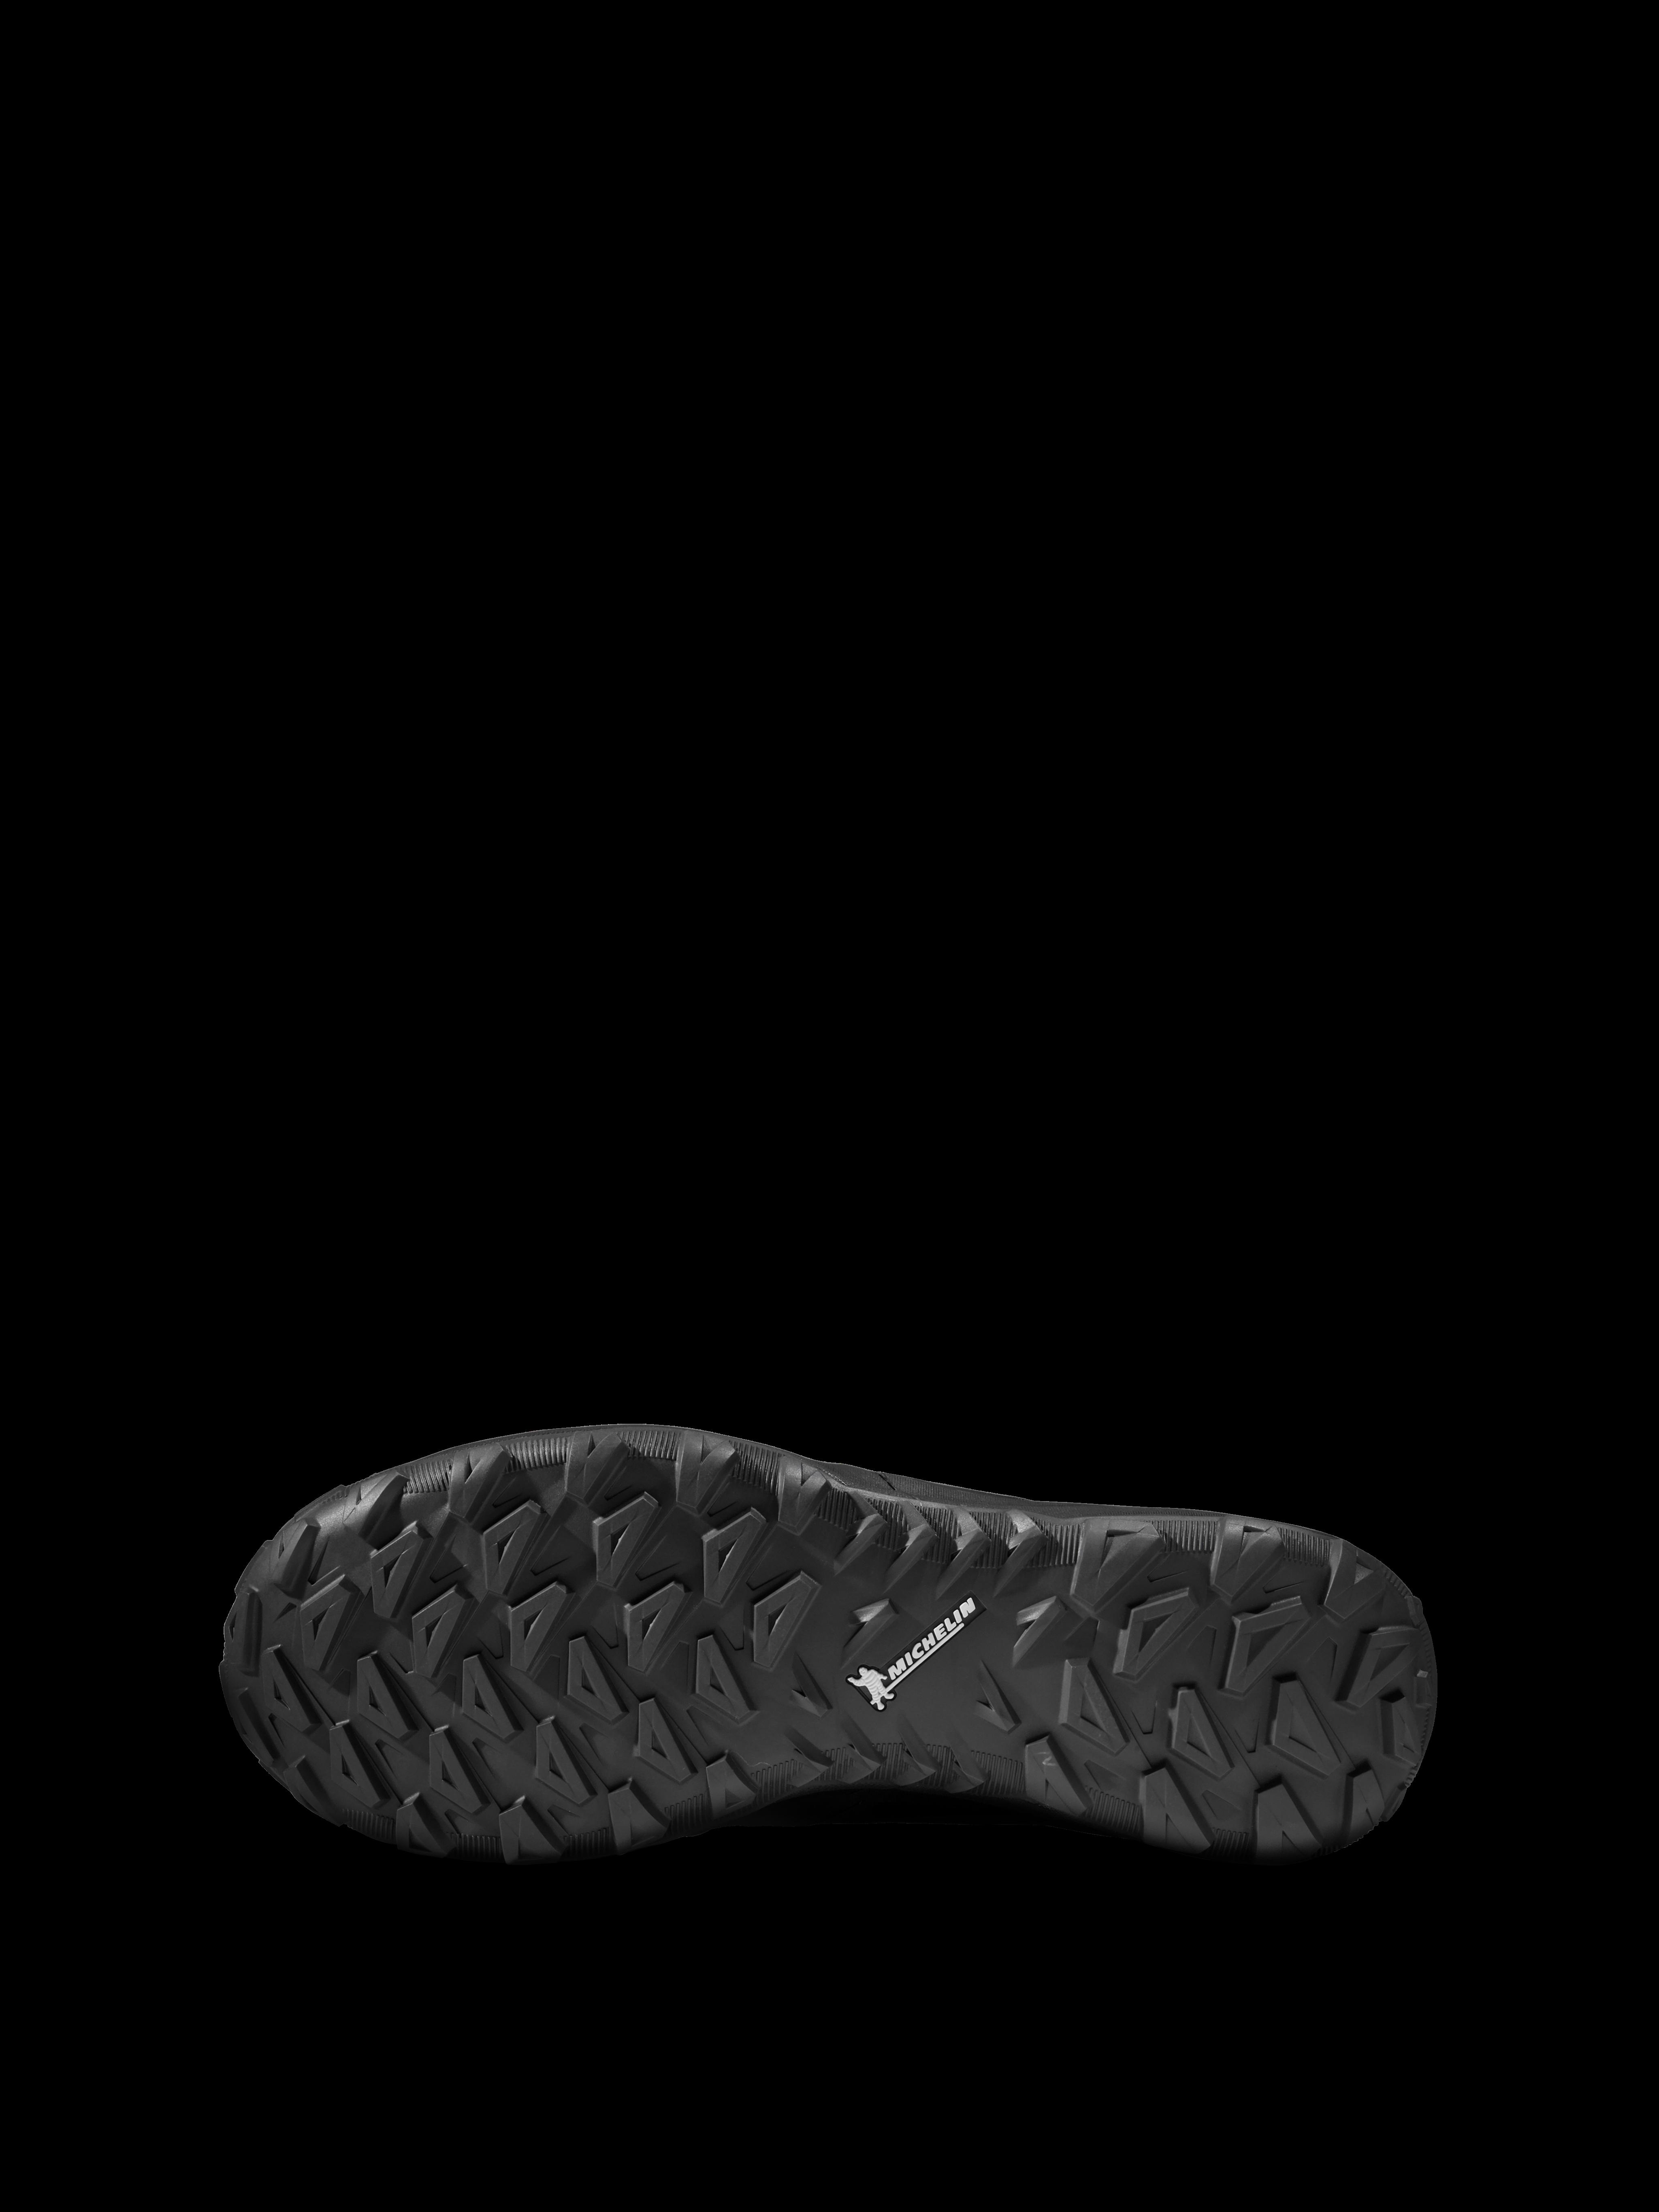 Saentis Low Men product image